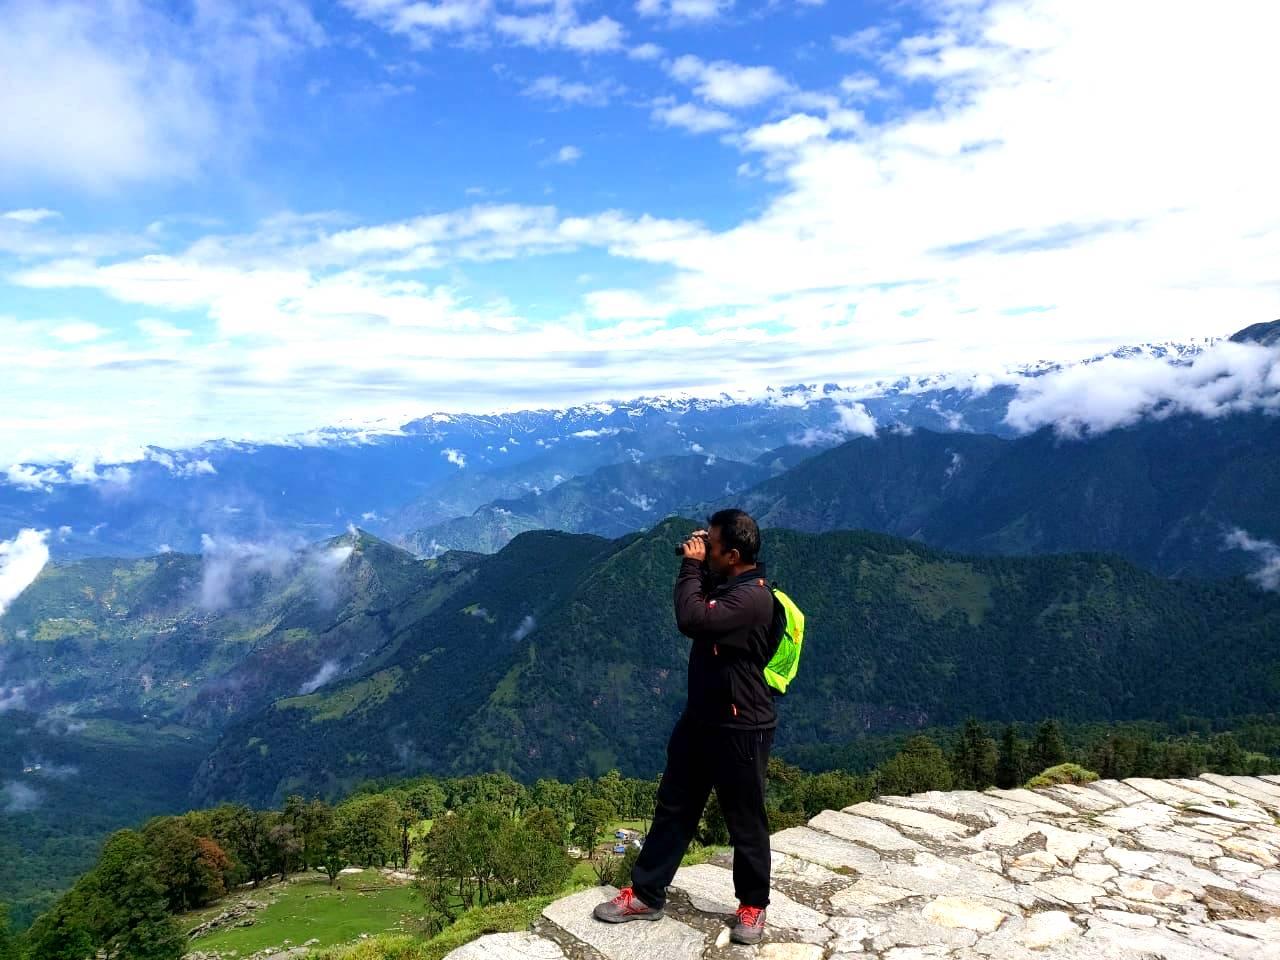 trekking-sightseeing-adventure